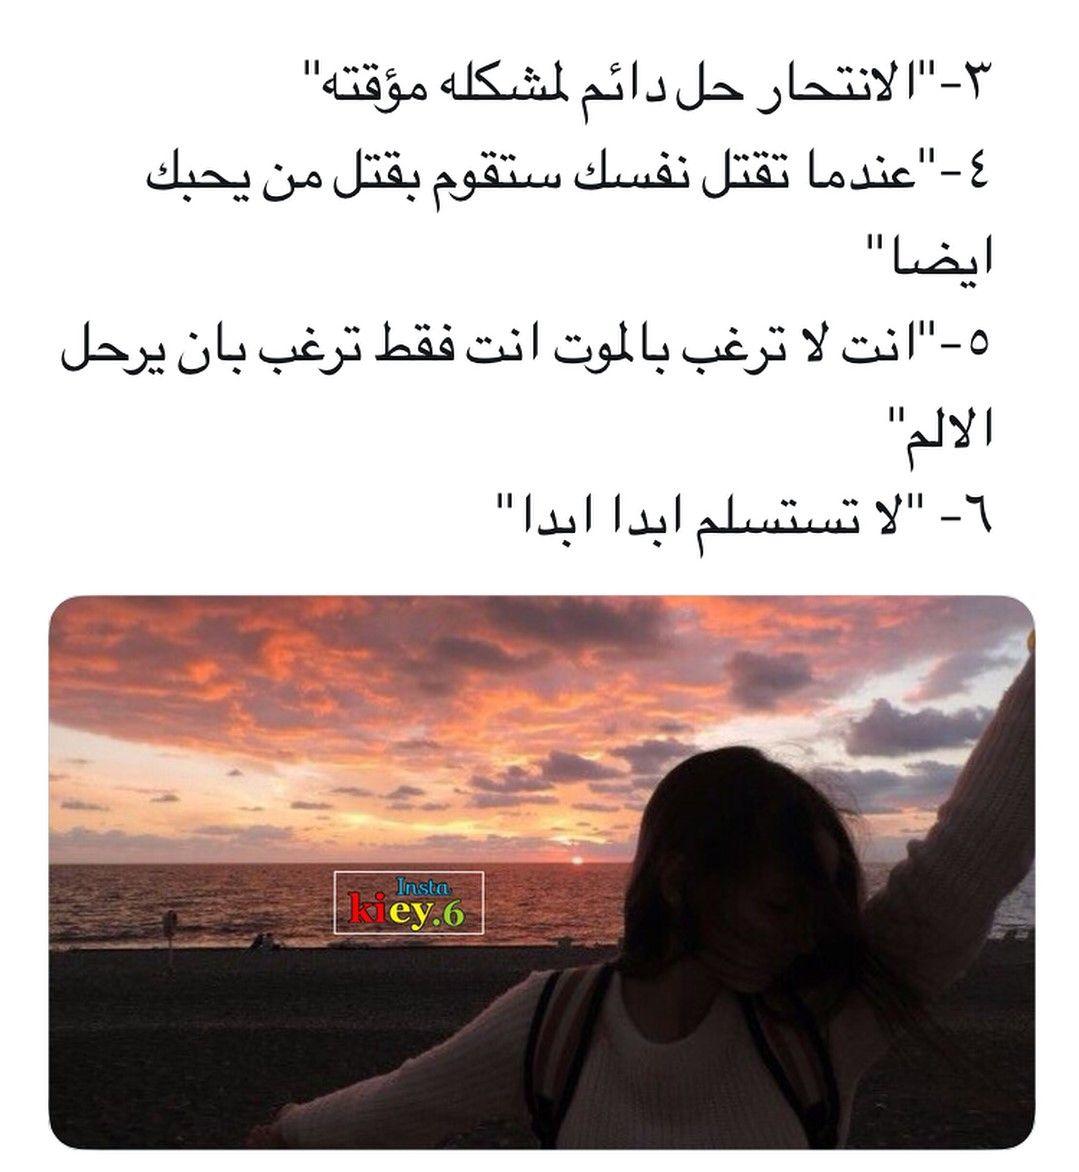 رسائل من اشخاص يرغبوا في الانتحار 2 Cool Words Love Words Photo Quotes